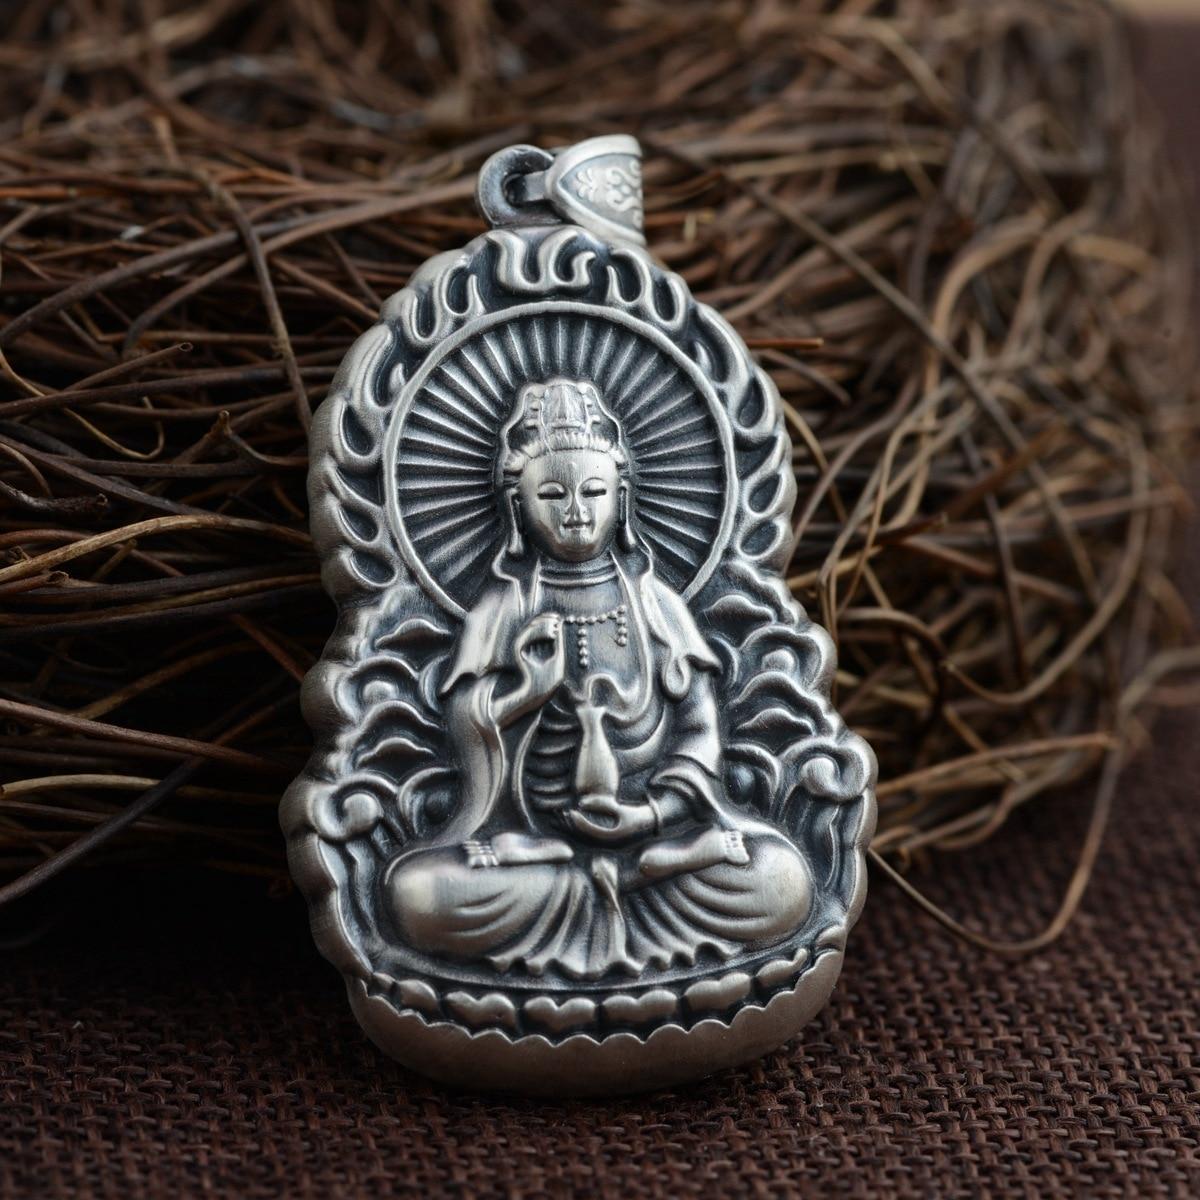 Cerf roi bijoux en gros 999 pendentif en argent fin Matt Avalokiteshvara pendentif nouvelle technologie